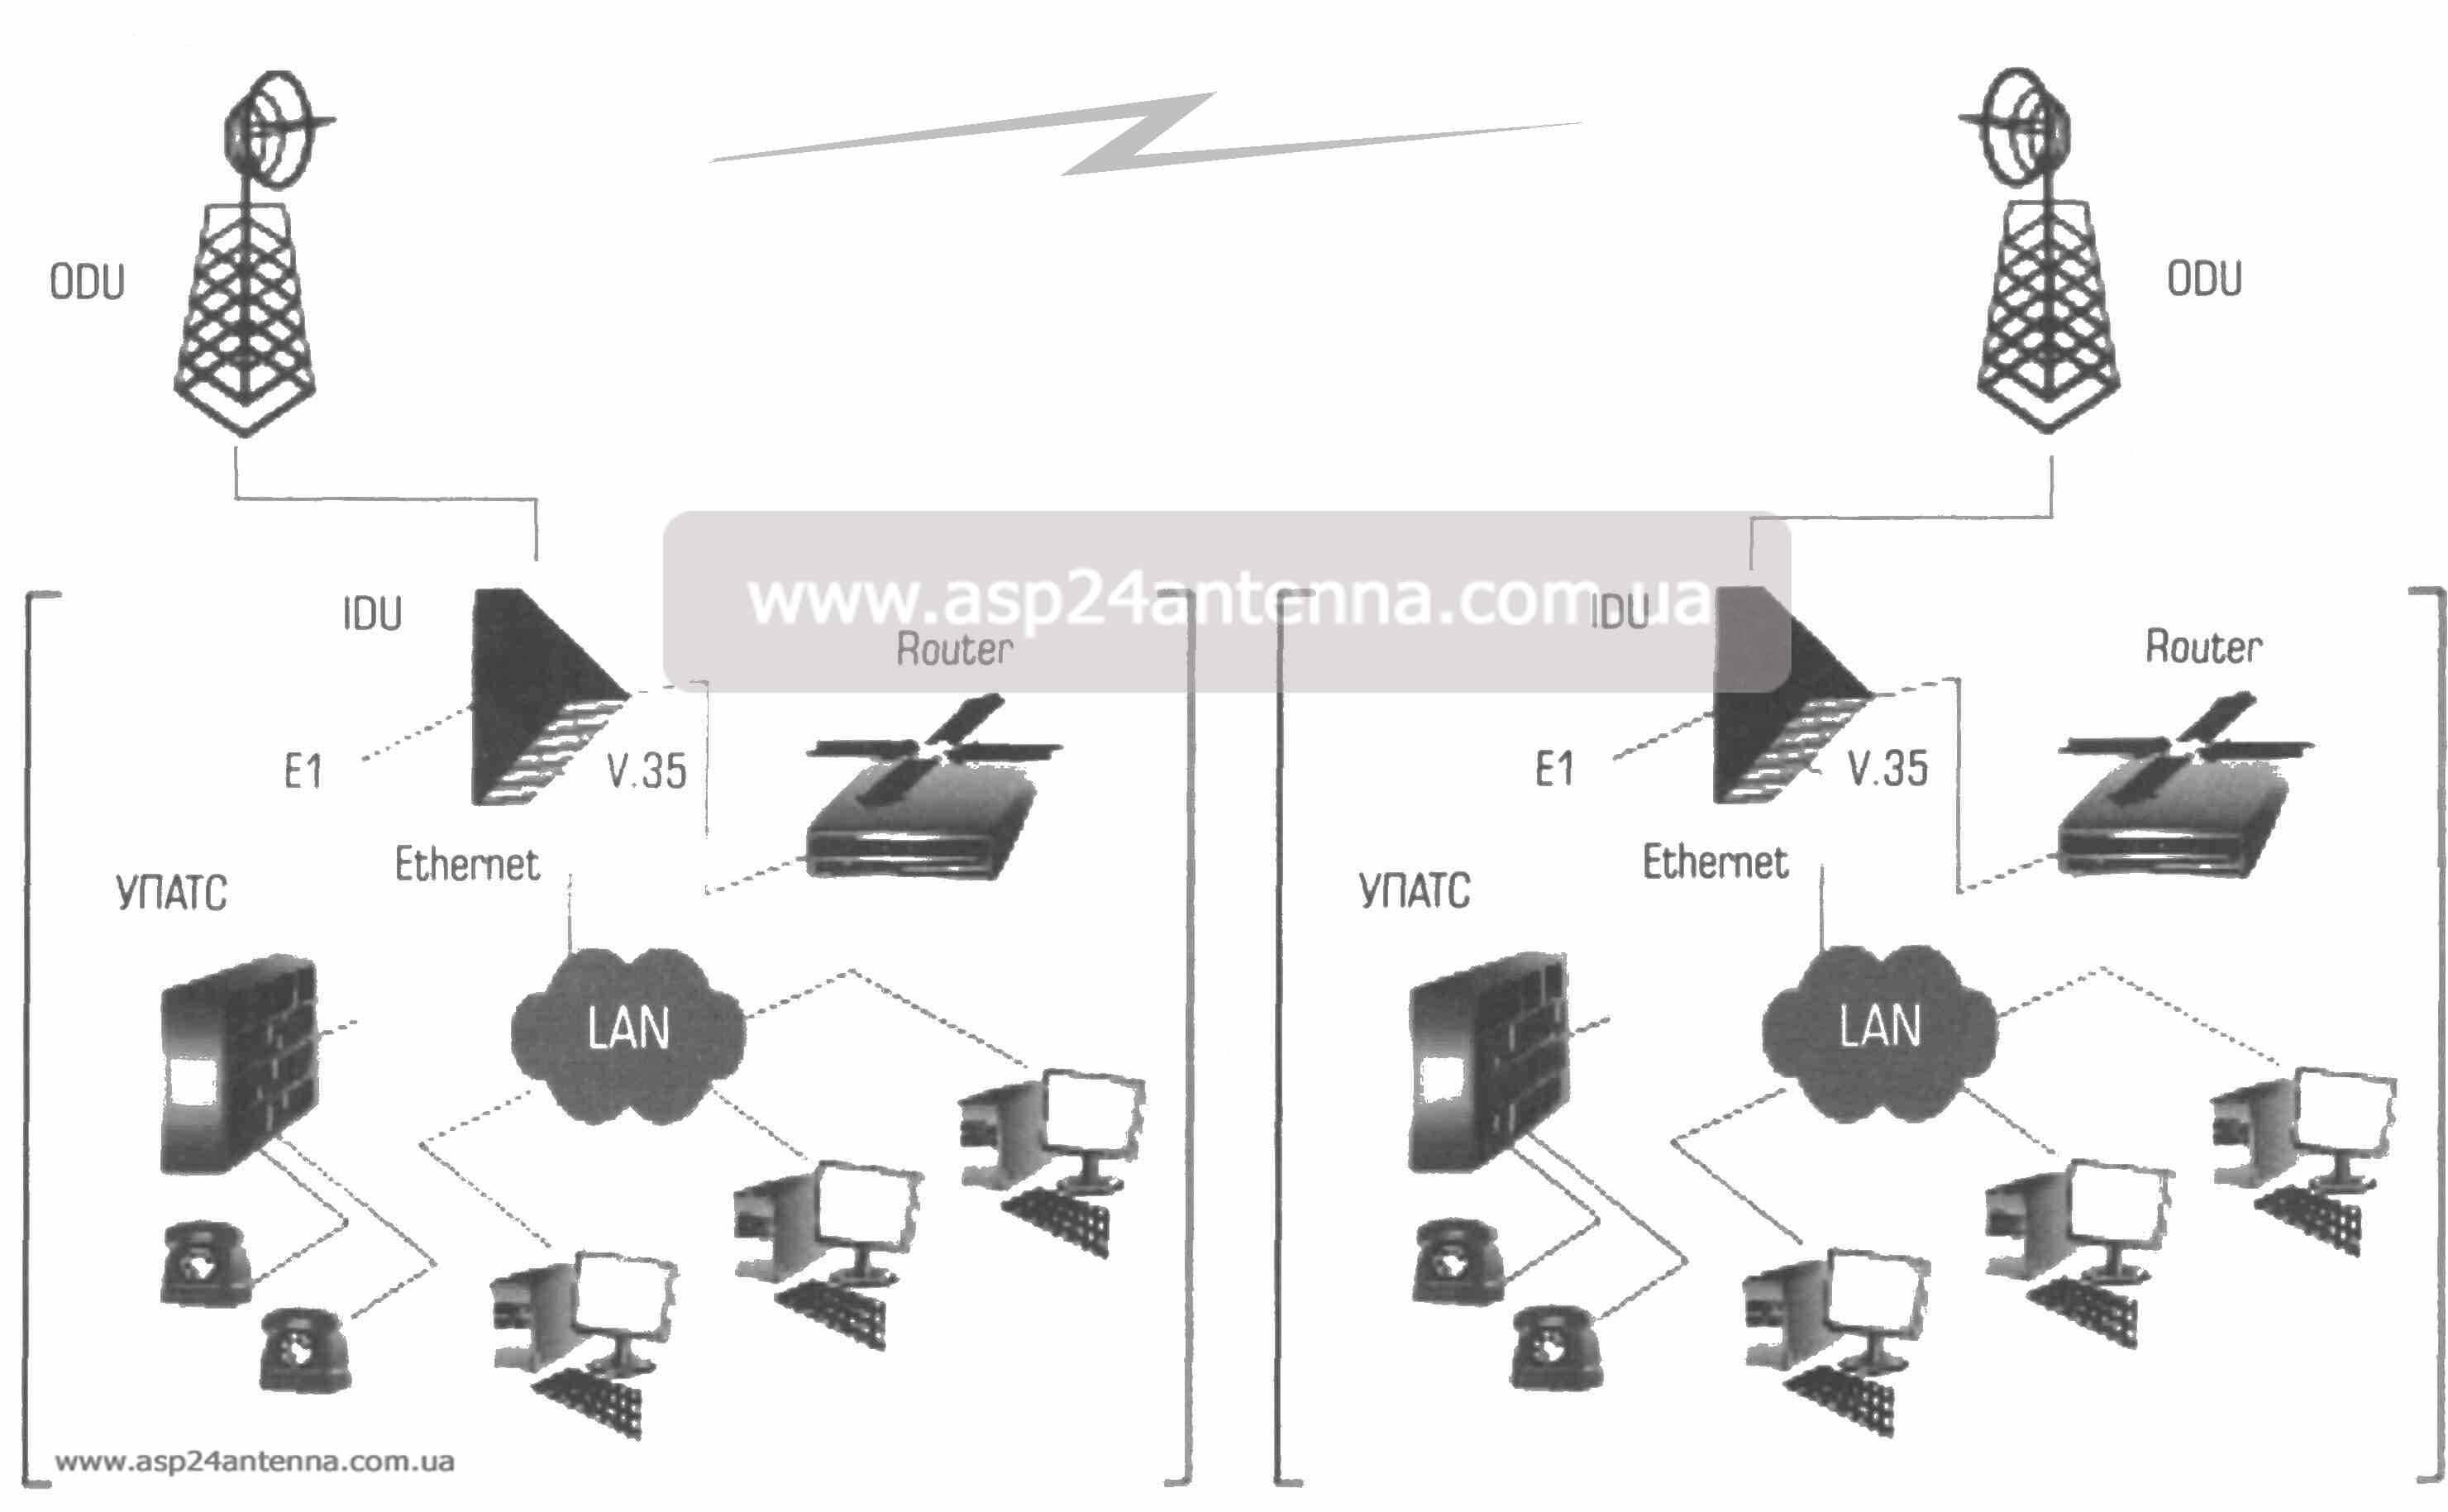 Index Of Blog Wp Content Uploads 2012 09 Modifications Power Over Ethernet Poe 1 El Fon